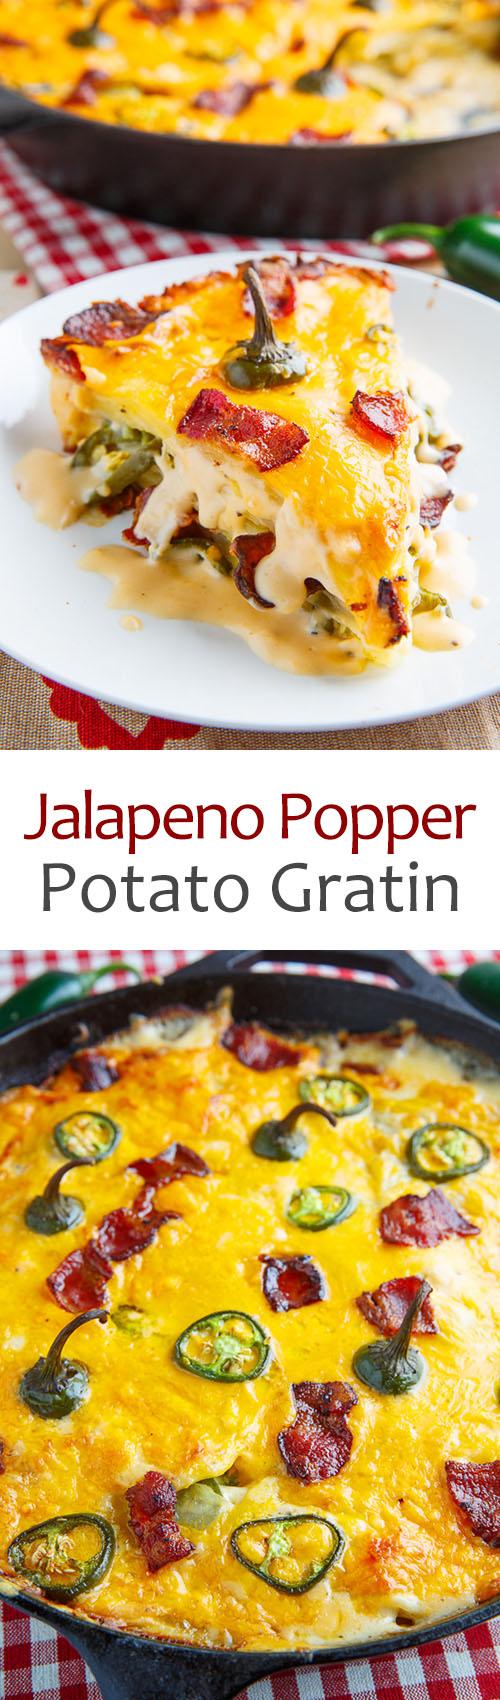 Jalapeno Popper Potato Gratin